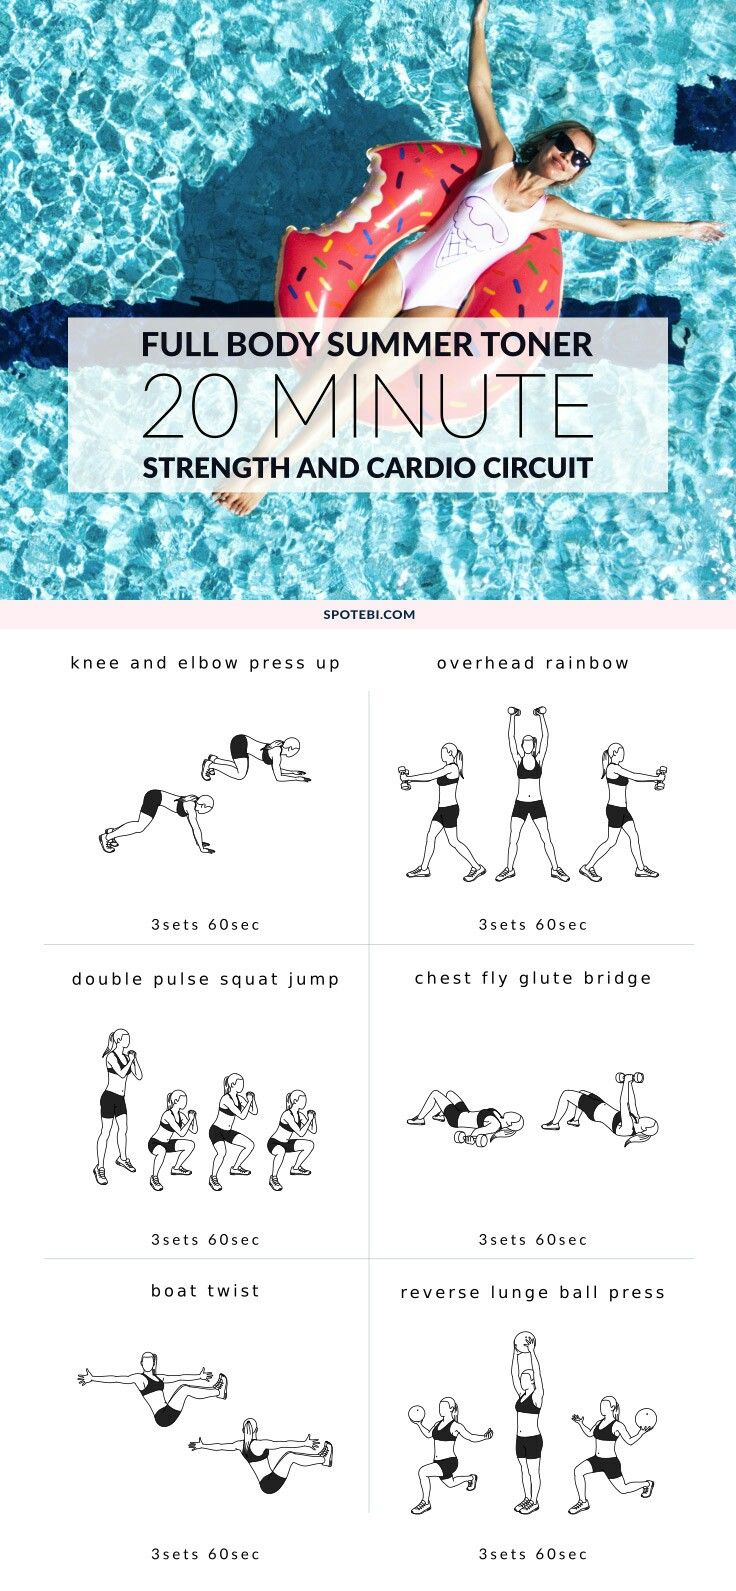 Full body Summer Toner 20 Minute strength and Cardio Circuit